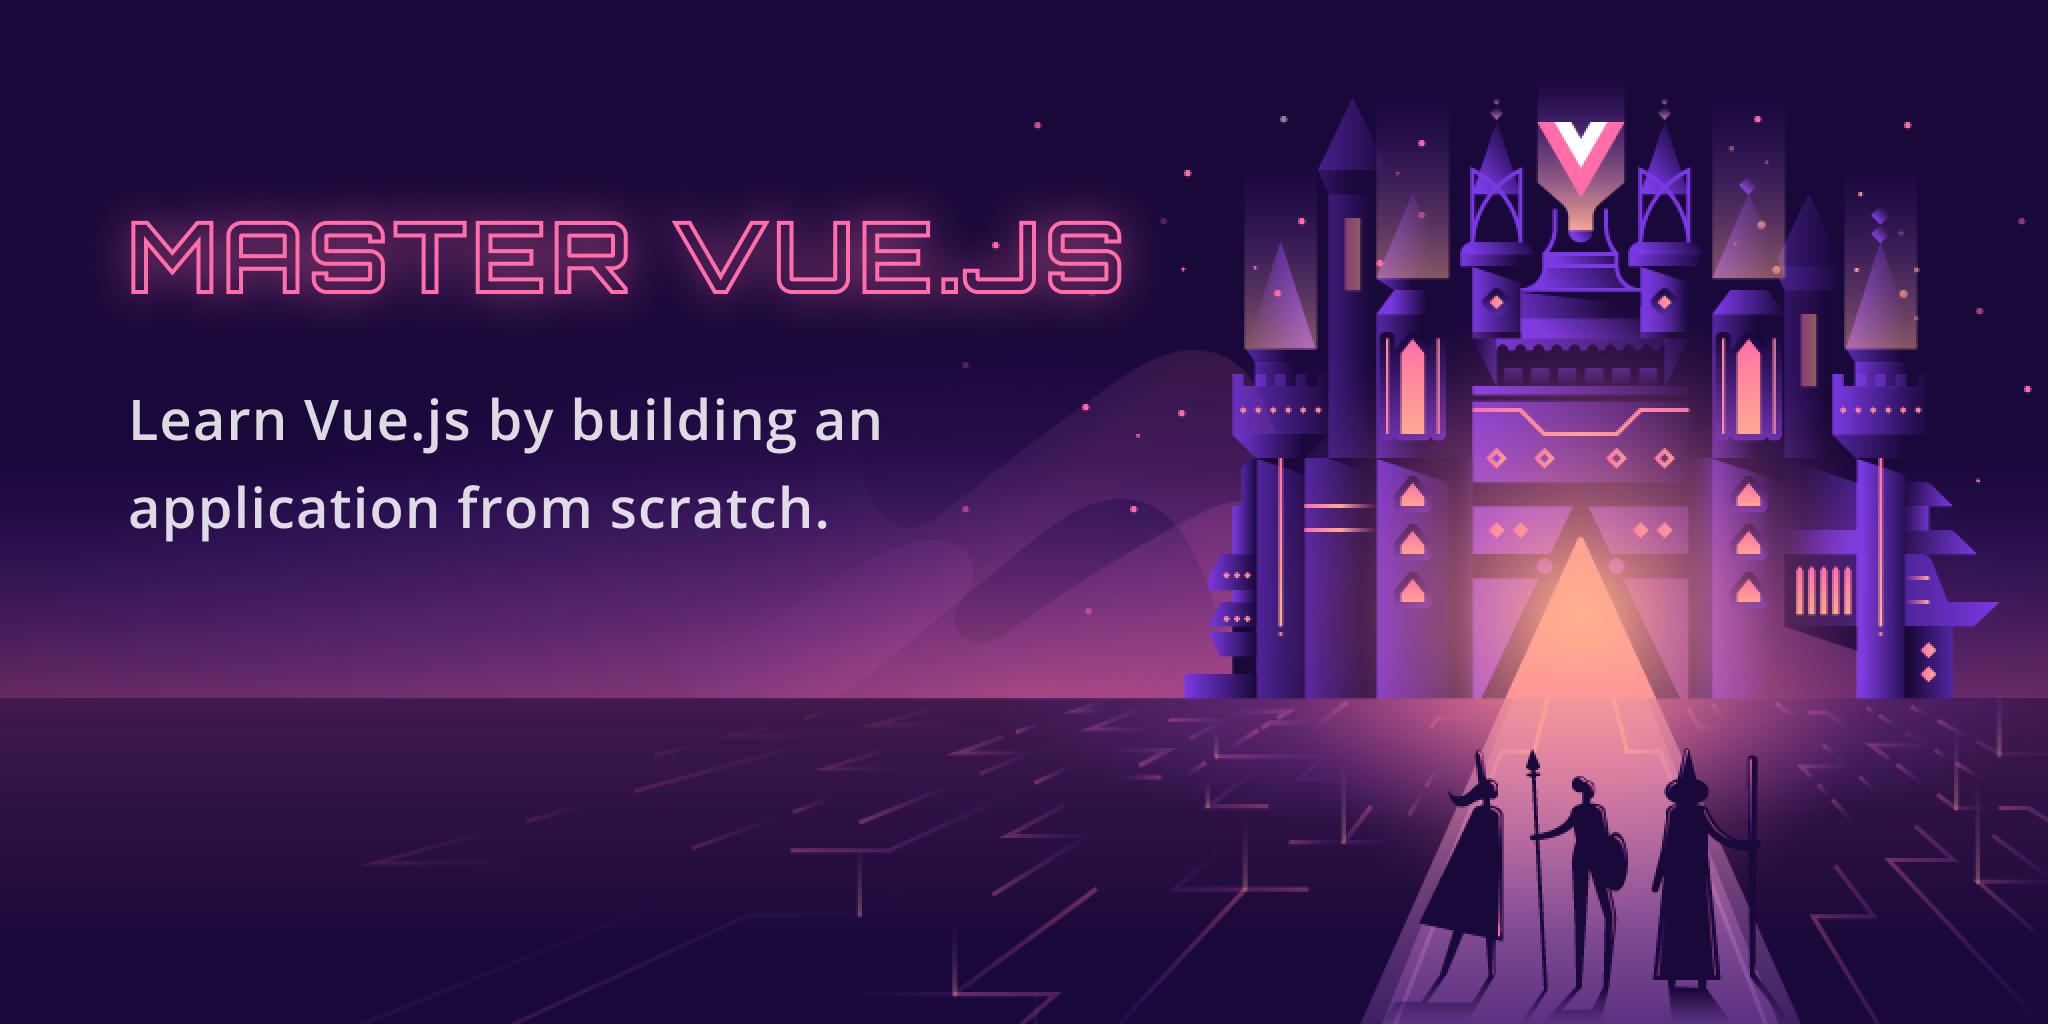 The Vue.js Master Class VueJS course